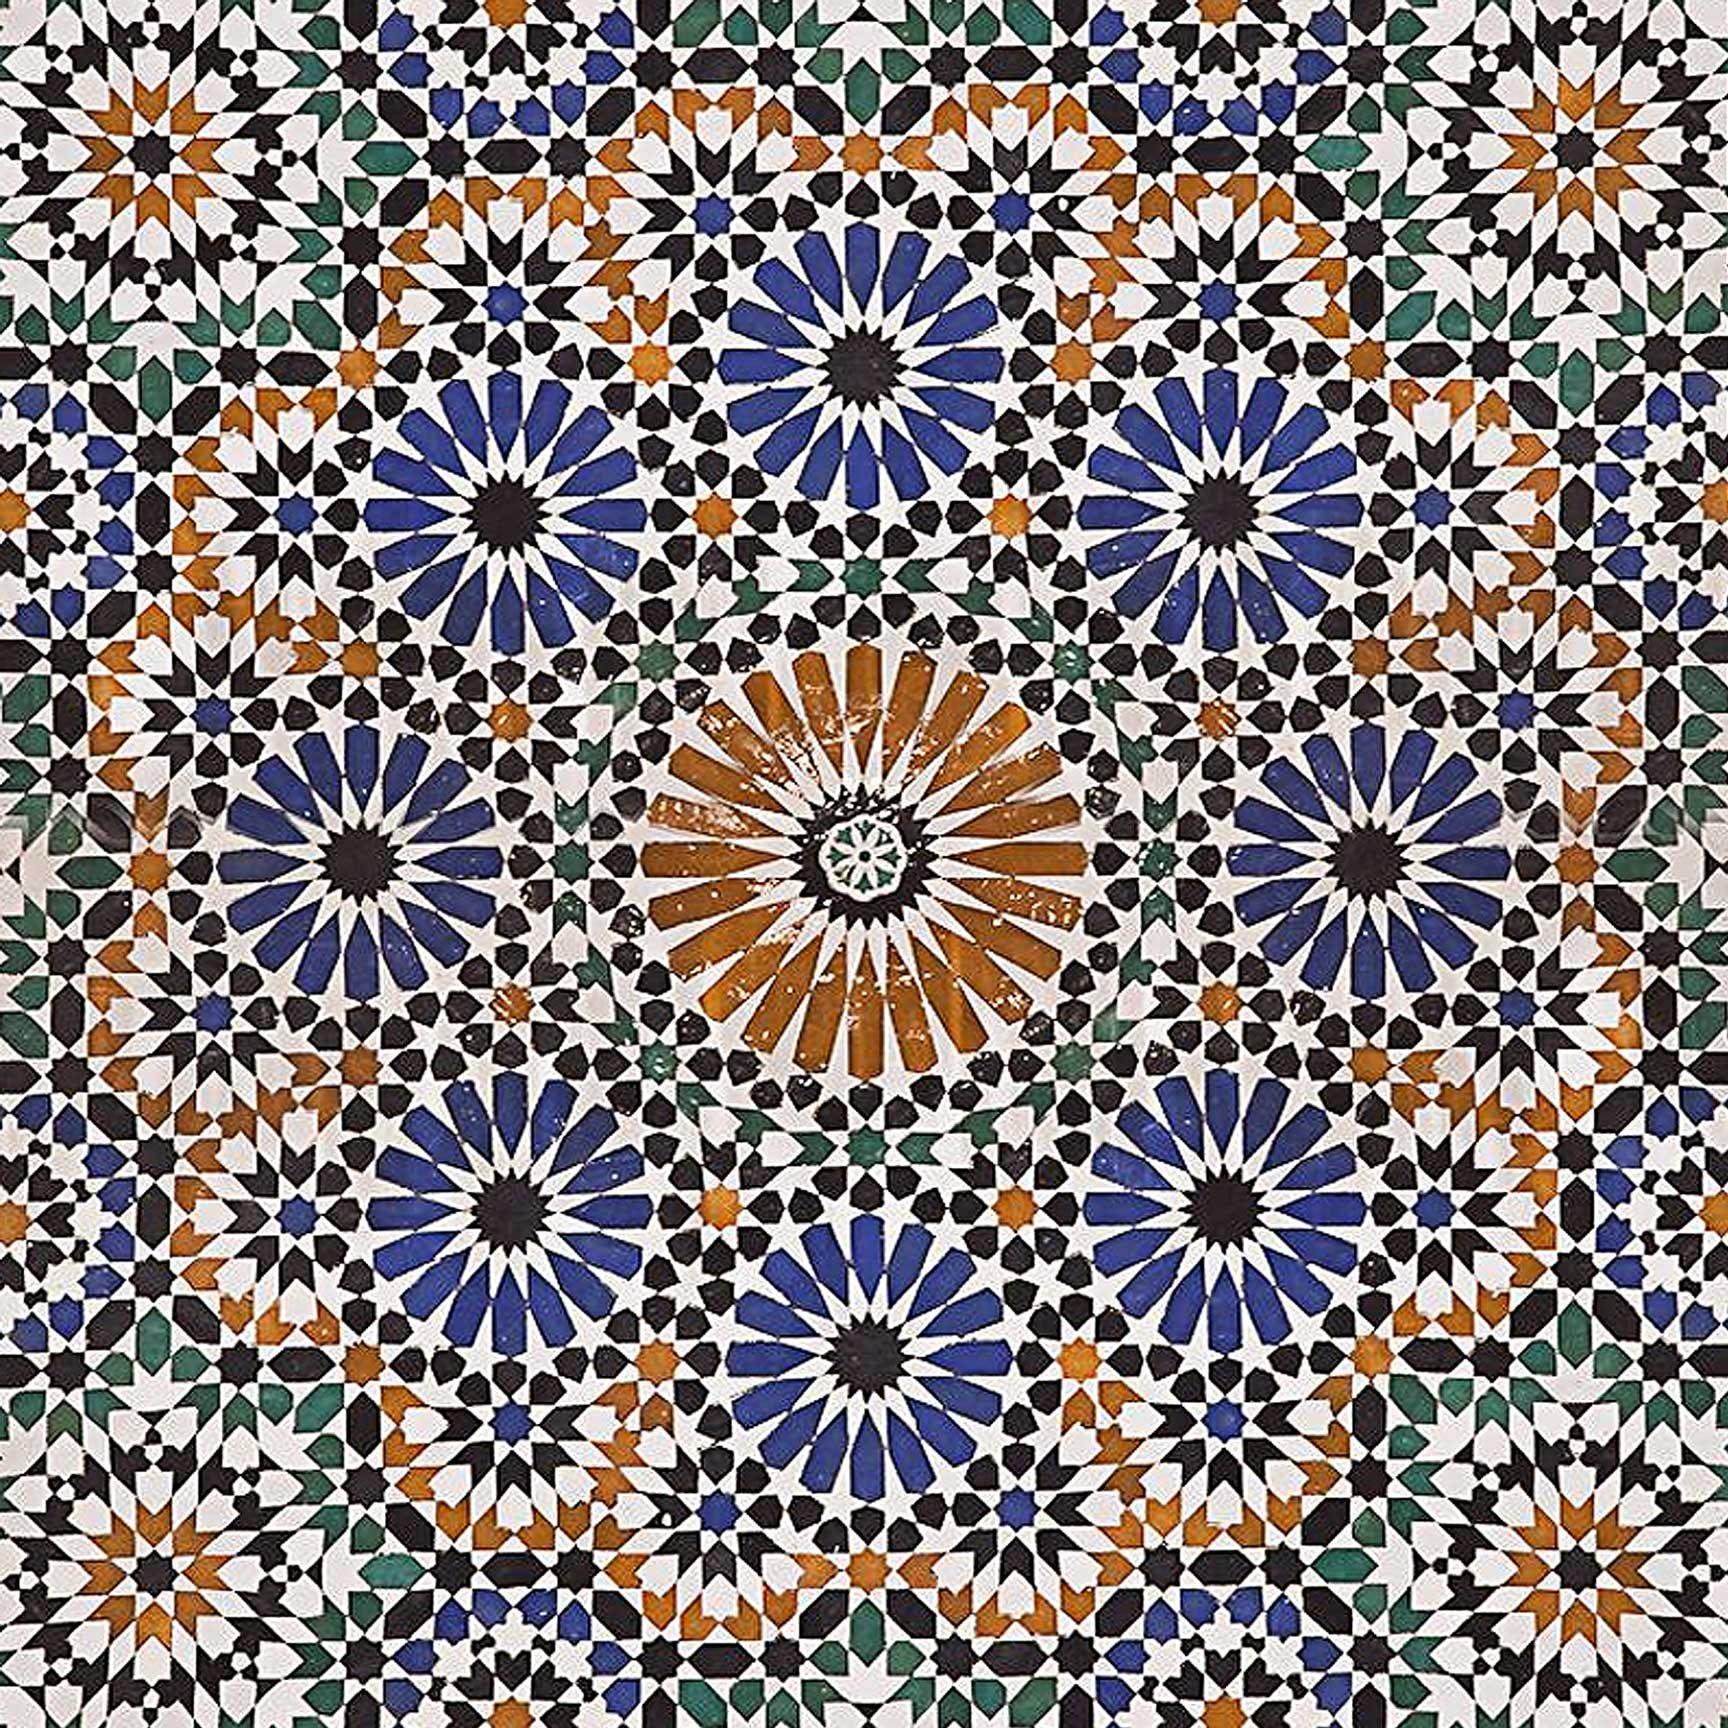 Morocco Mosaic Printed Ceiling Tile Home Decor Mosaic